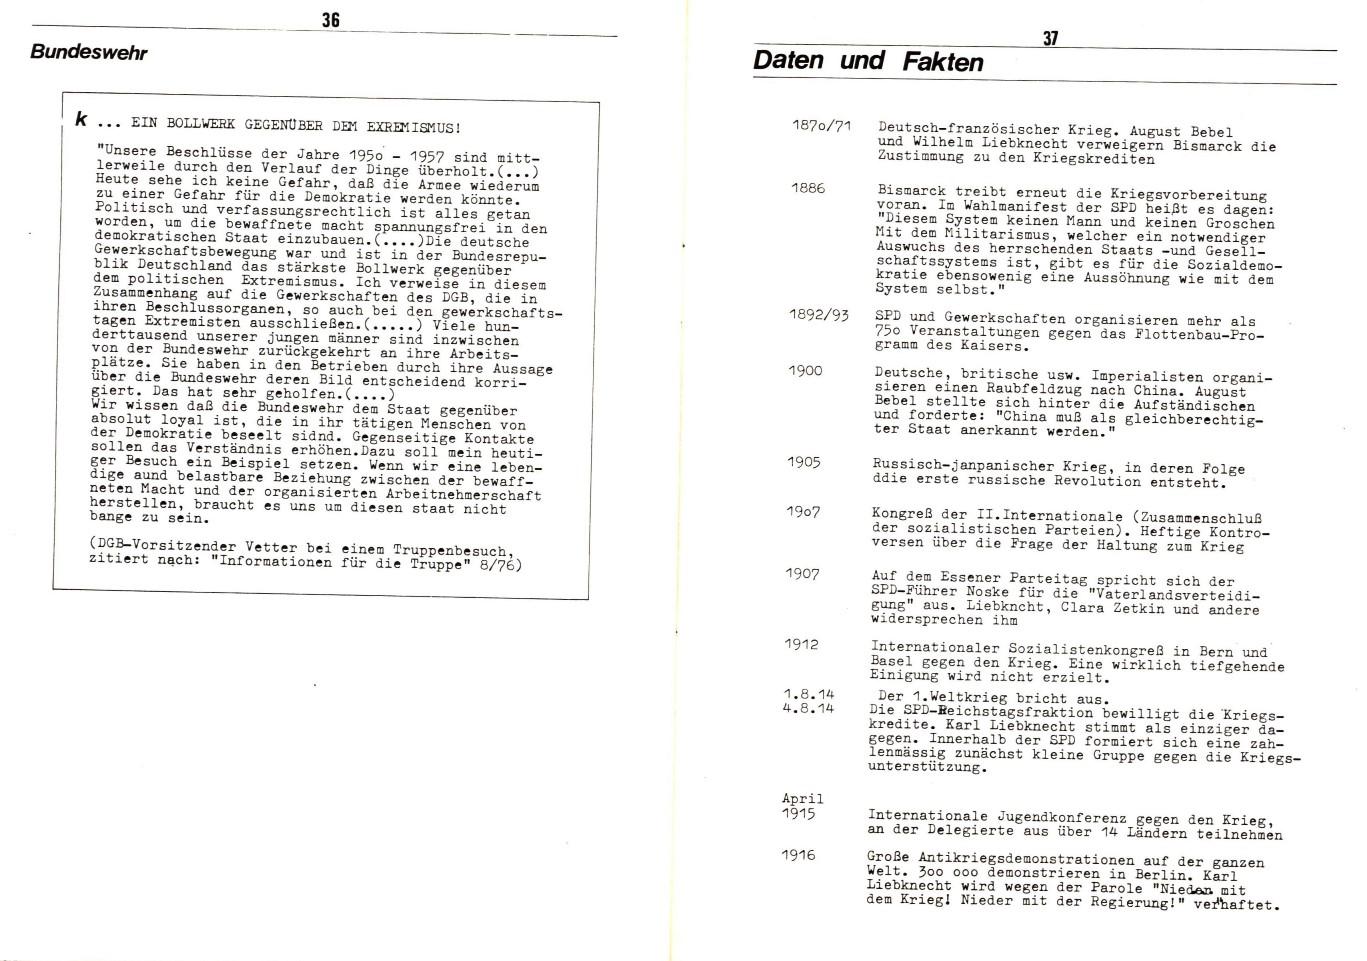 KJVD_1979_Dokumente_zum_Antikriegstag_22